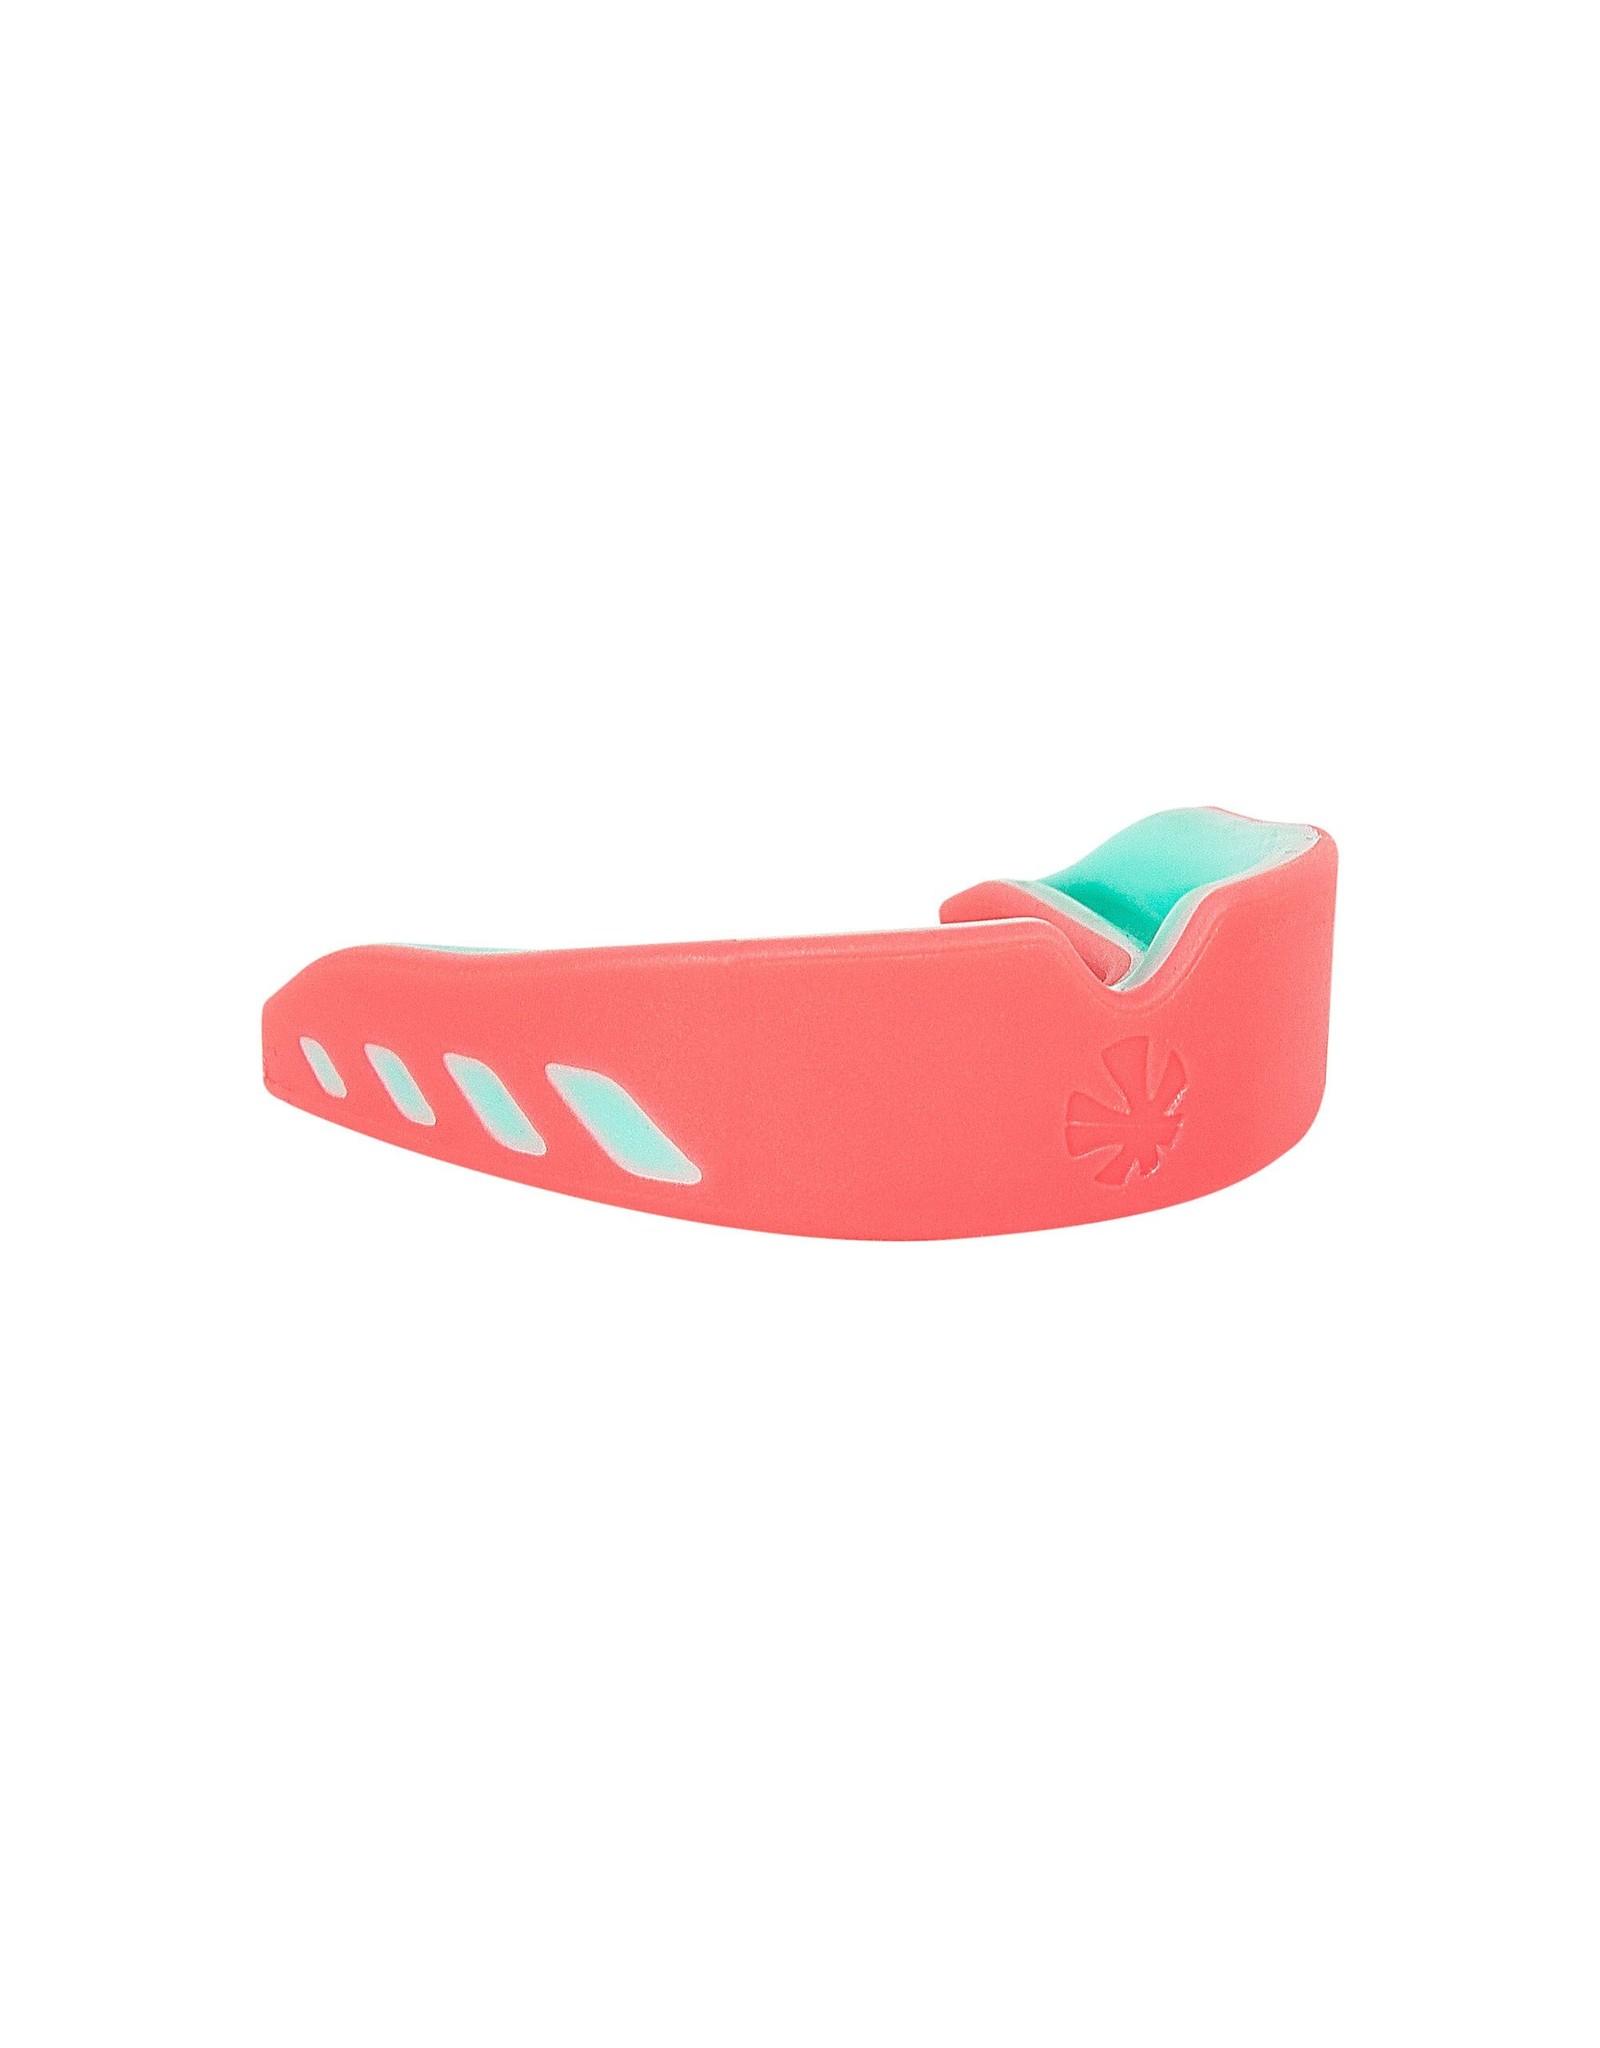 Reece Australia Ultra Safe Mouthguard-Coral